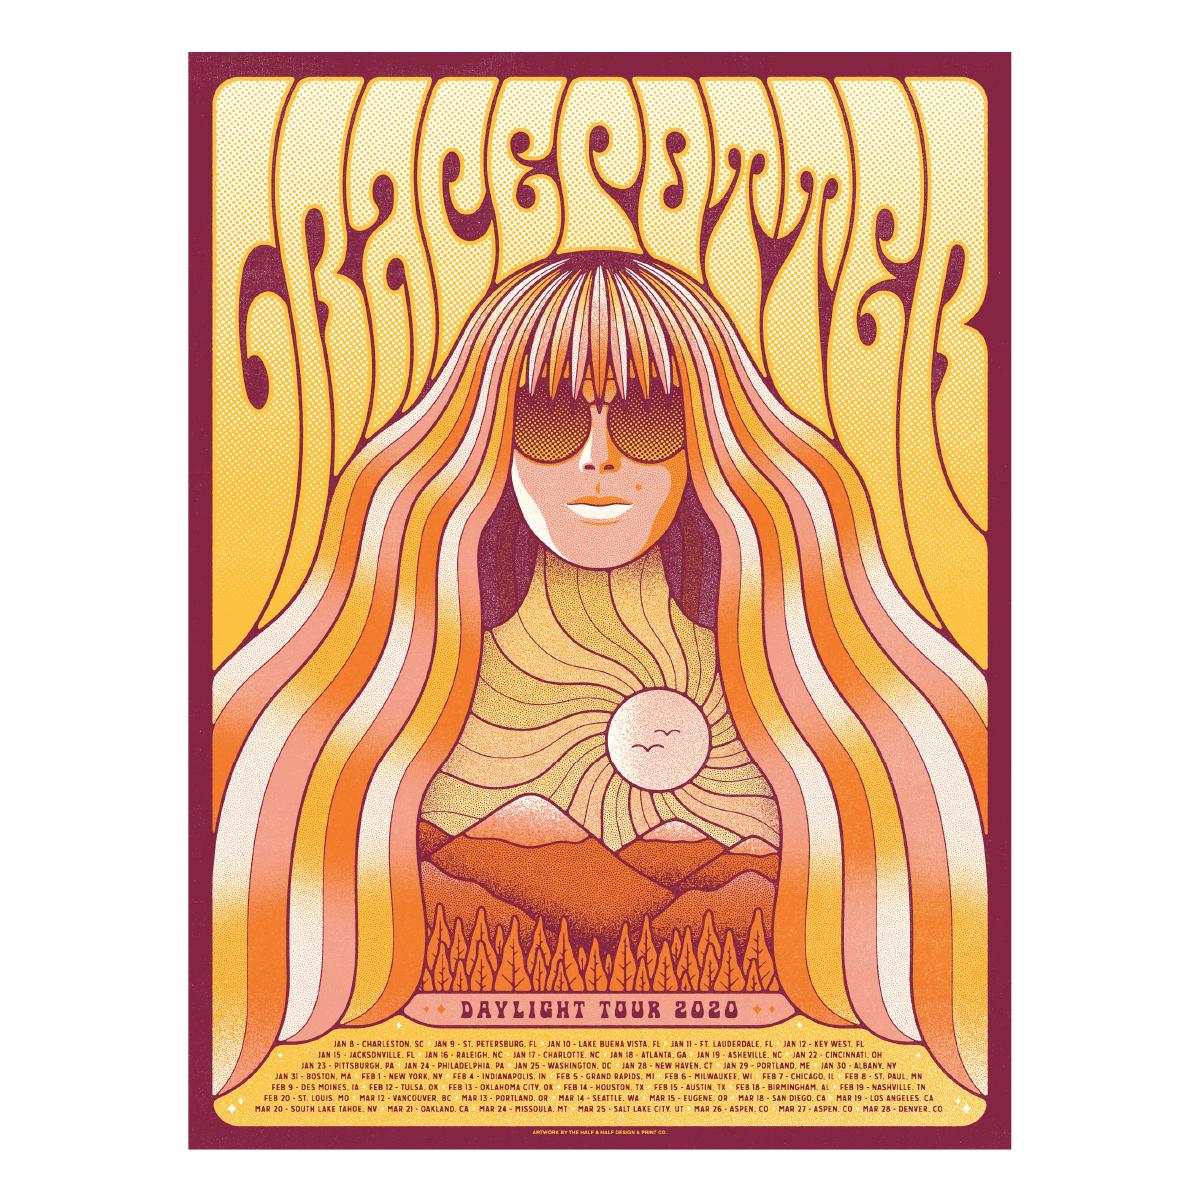 Daylight Tour Poster